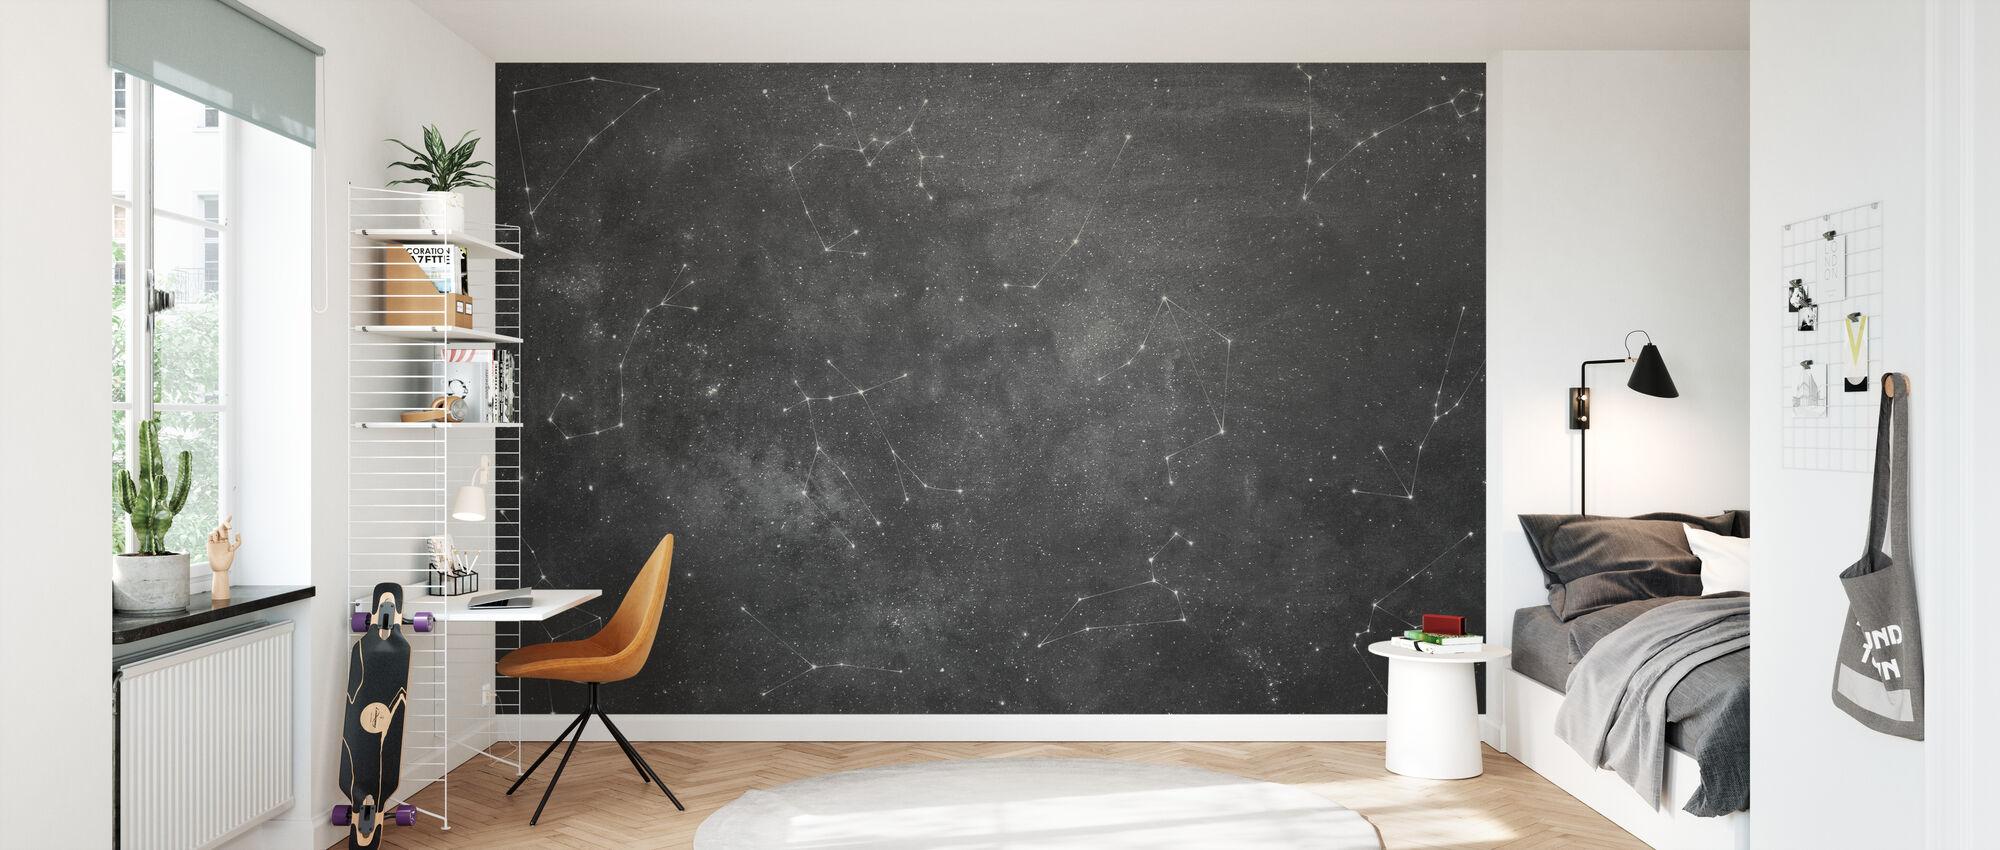 Zoodiac Sky V - Wallpaper - Kids Room